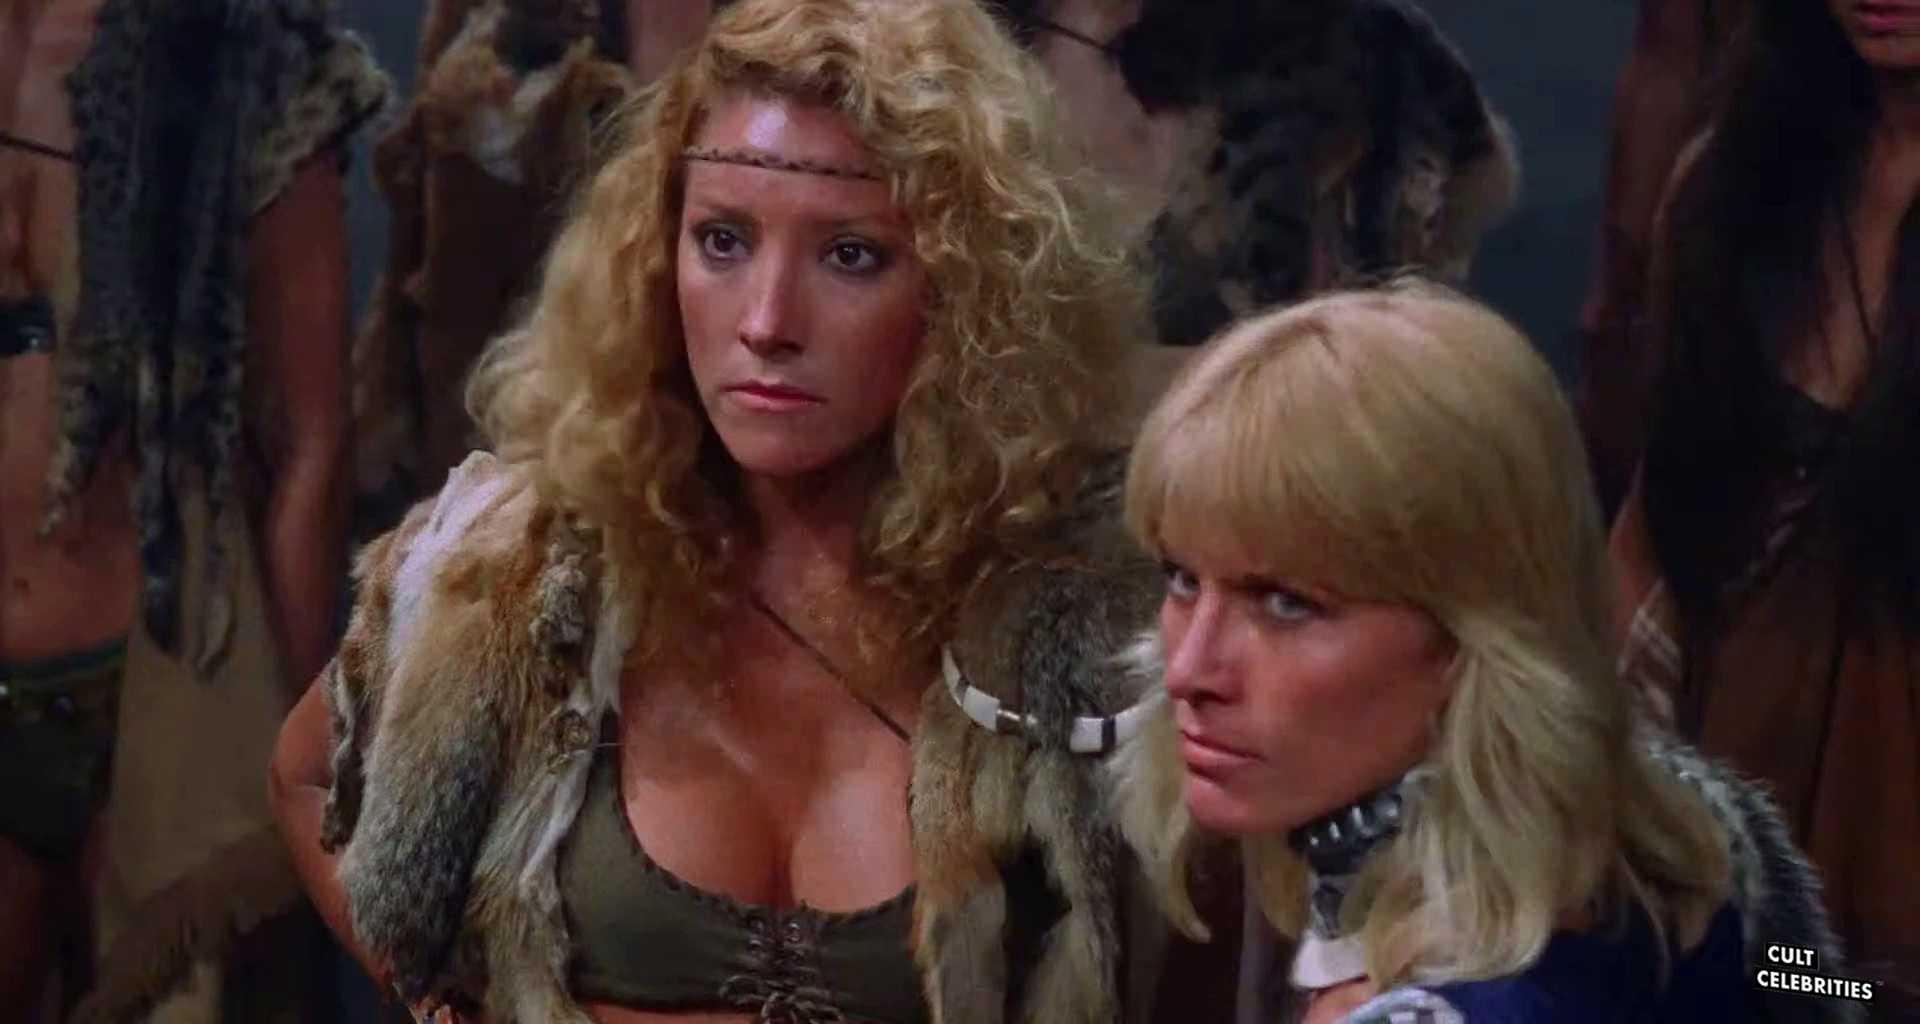 Mindi Miller and Danitza Kingsley in Amazons (1986)